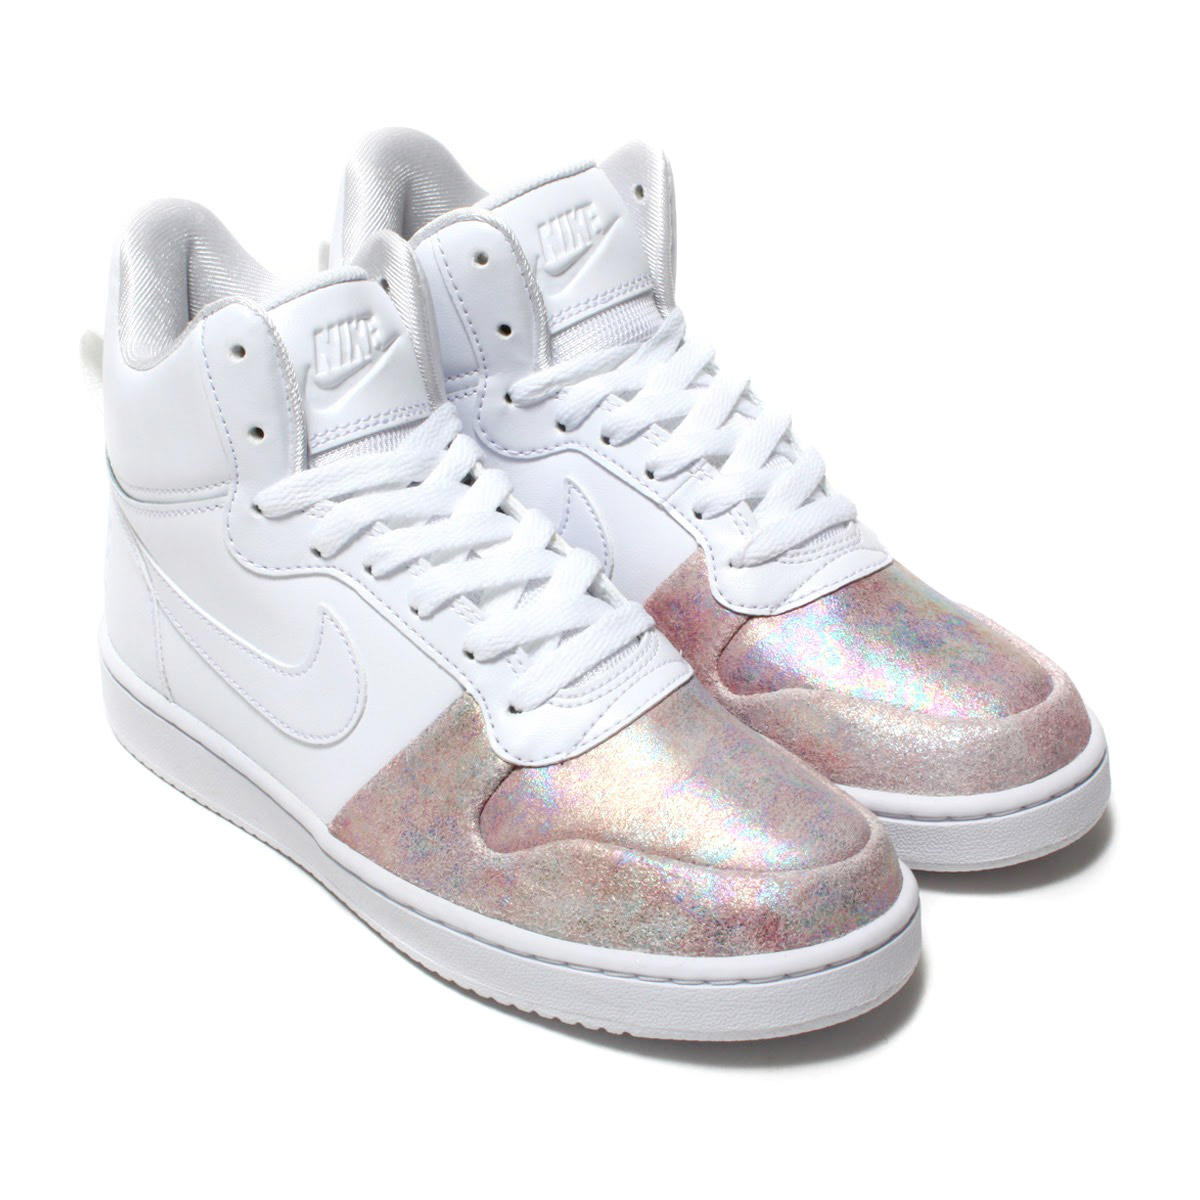 sports shoes 7cc19 55e03 NIKE W COURT BOROUGH MID PREM (Nike women coat Barlow mid premium)  WHITE WHITE-ROSE GOLD 17HO-I